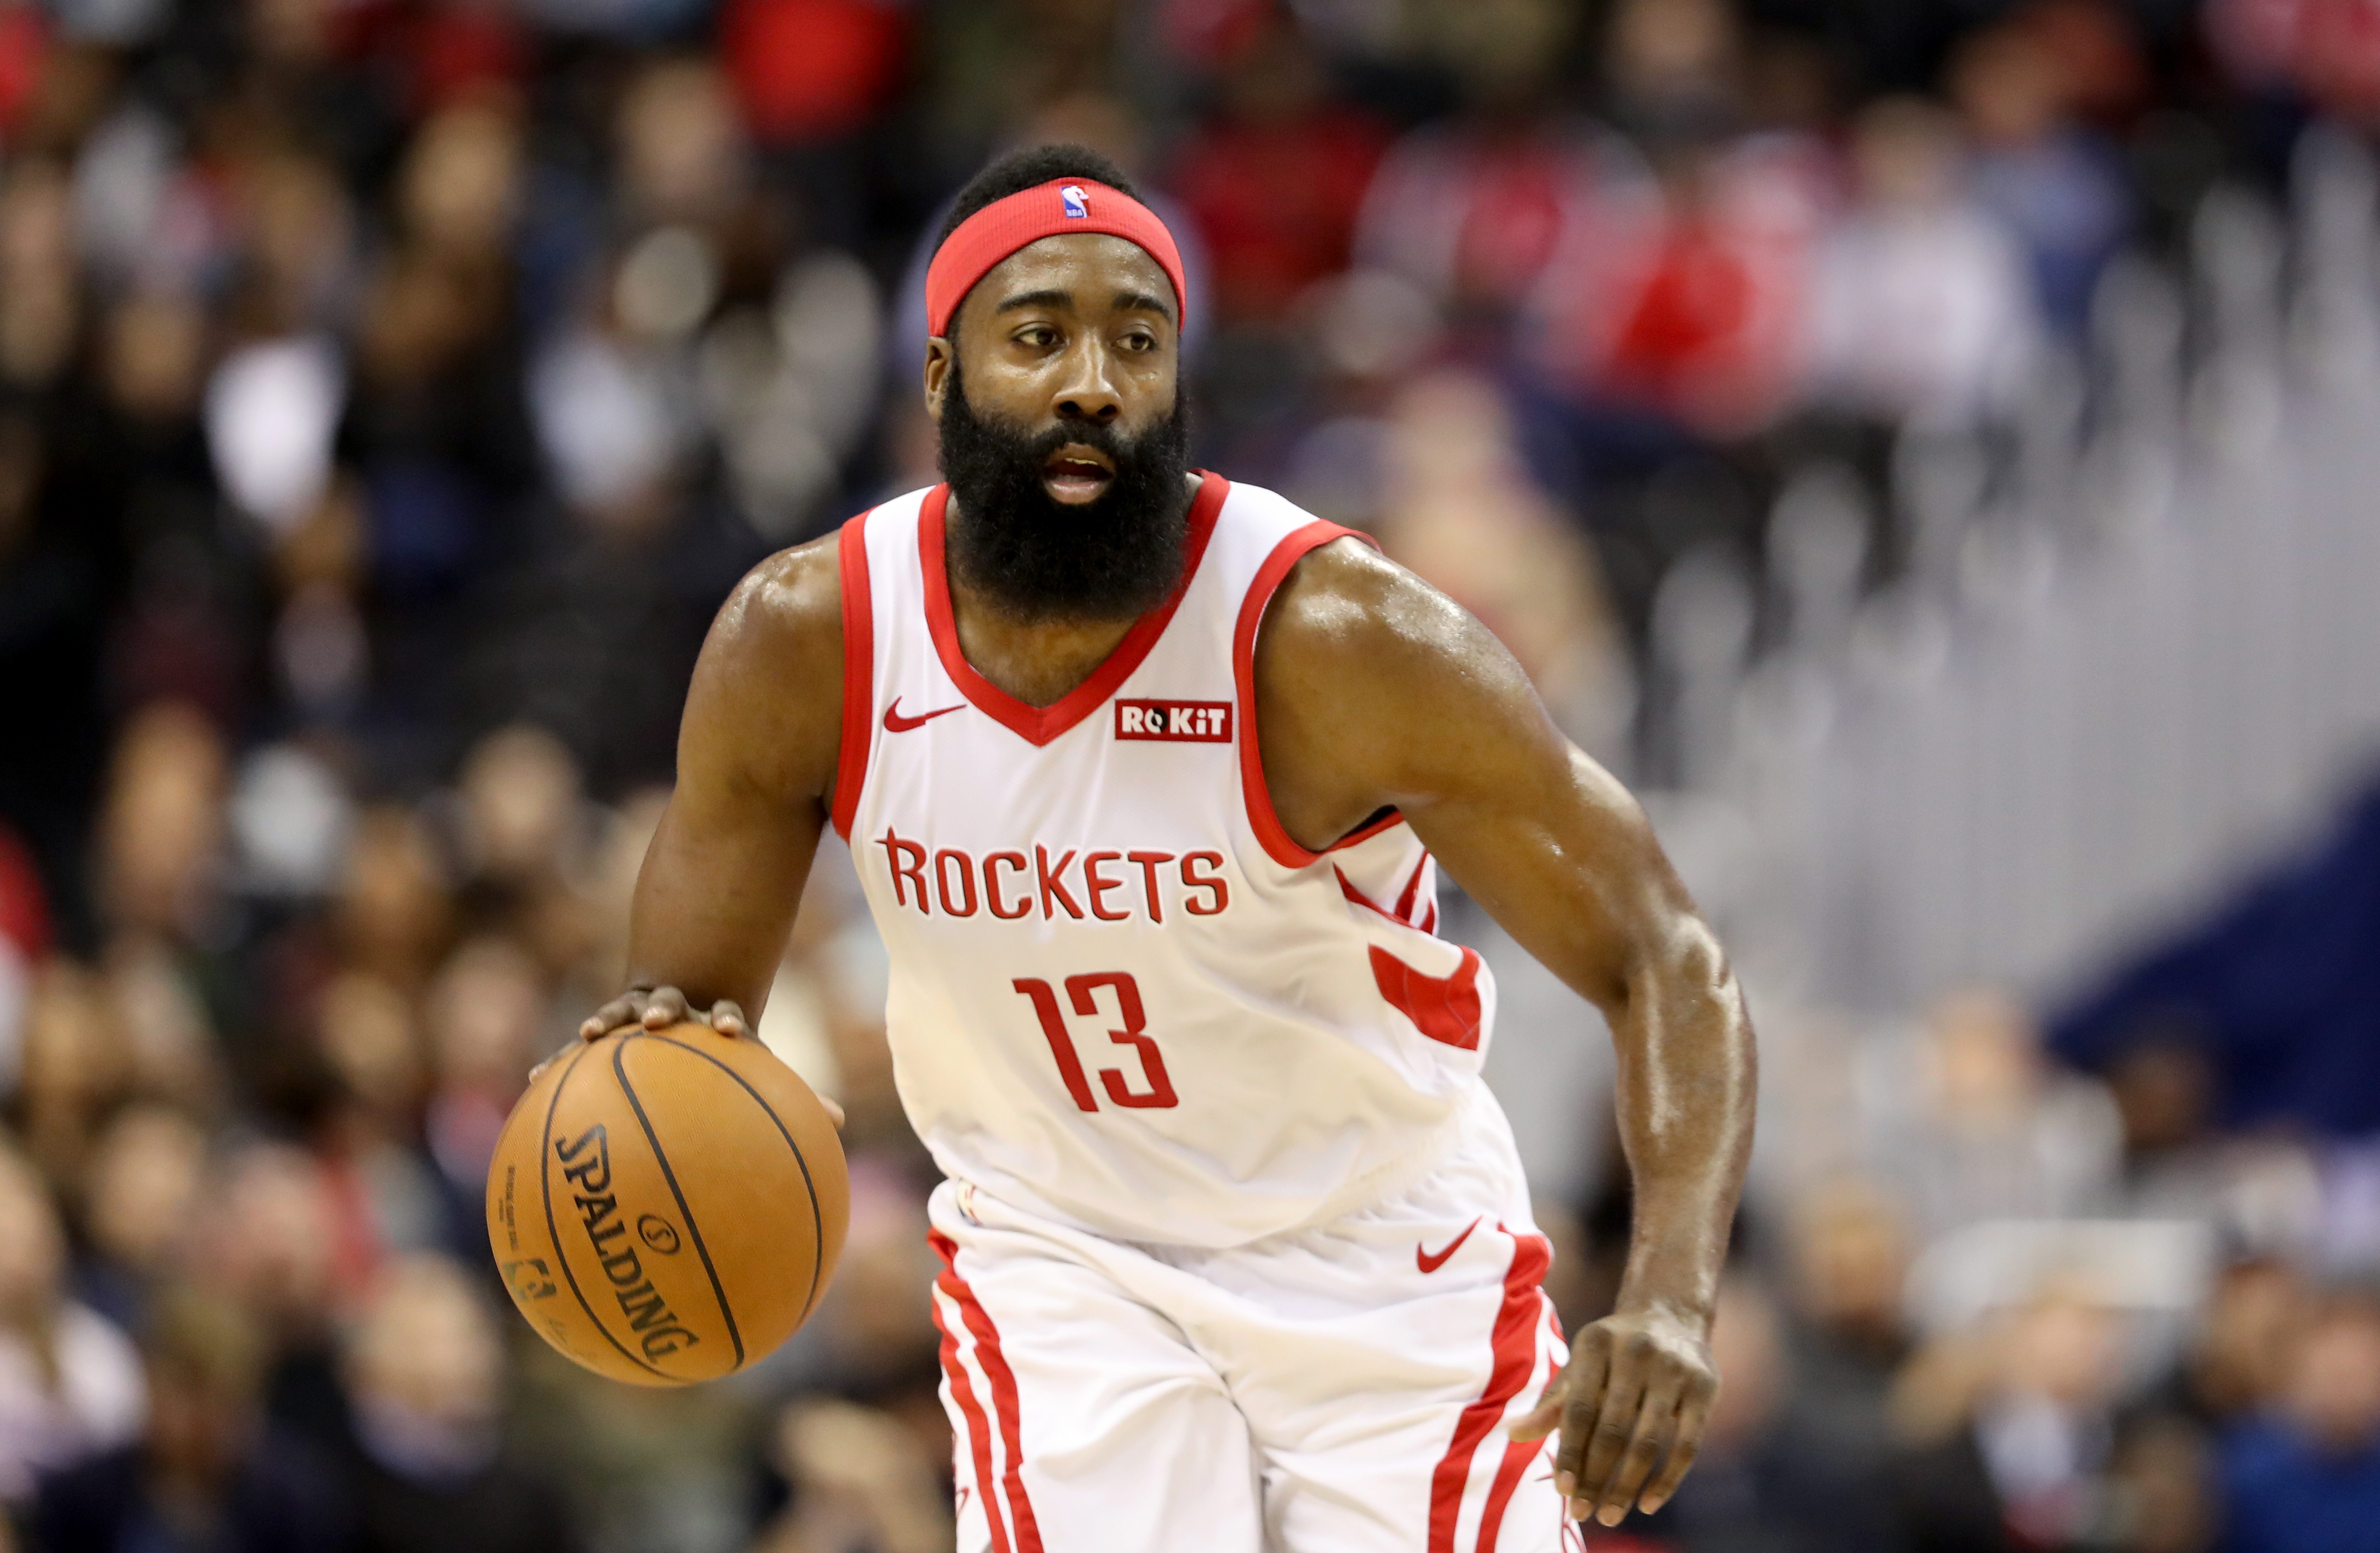 Rockets Fans Want More 'Headband Harden' After Huge Performance   Heavy.com